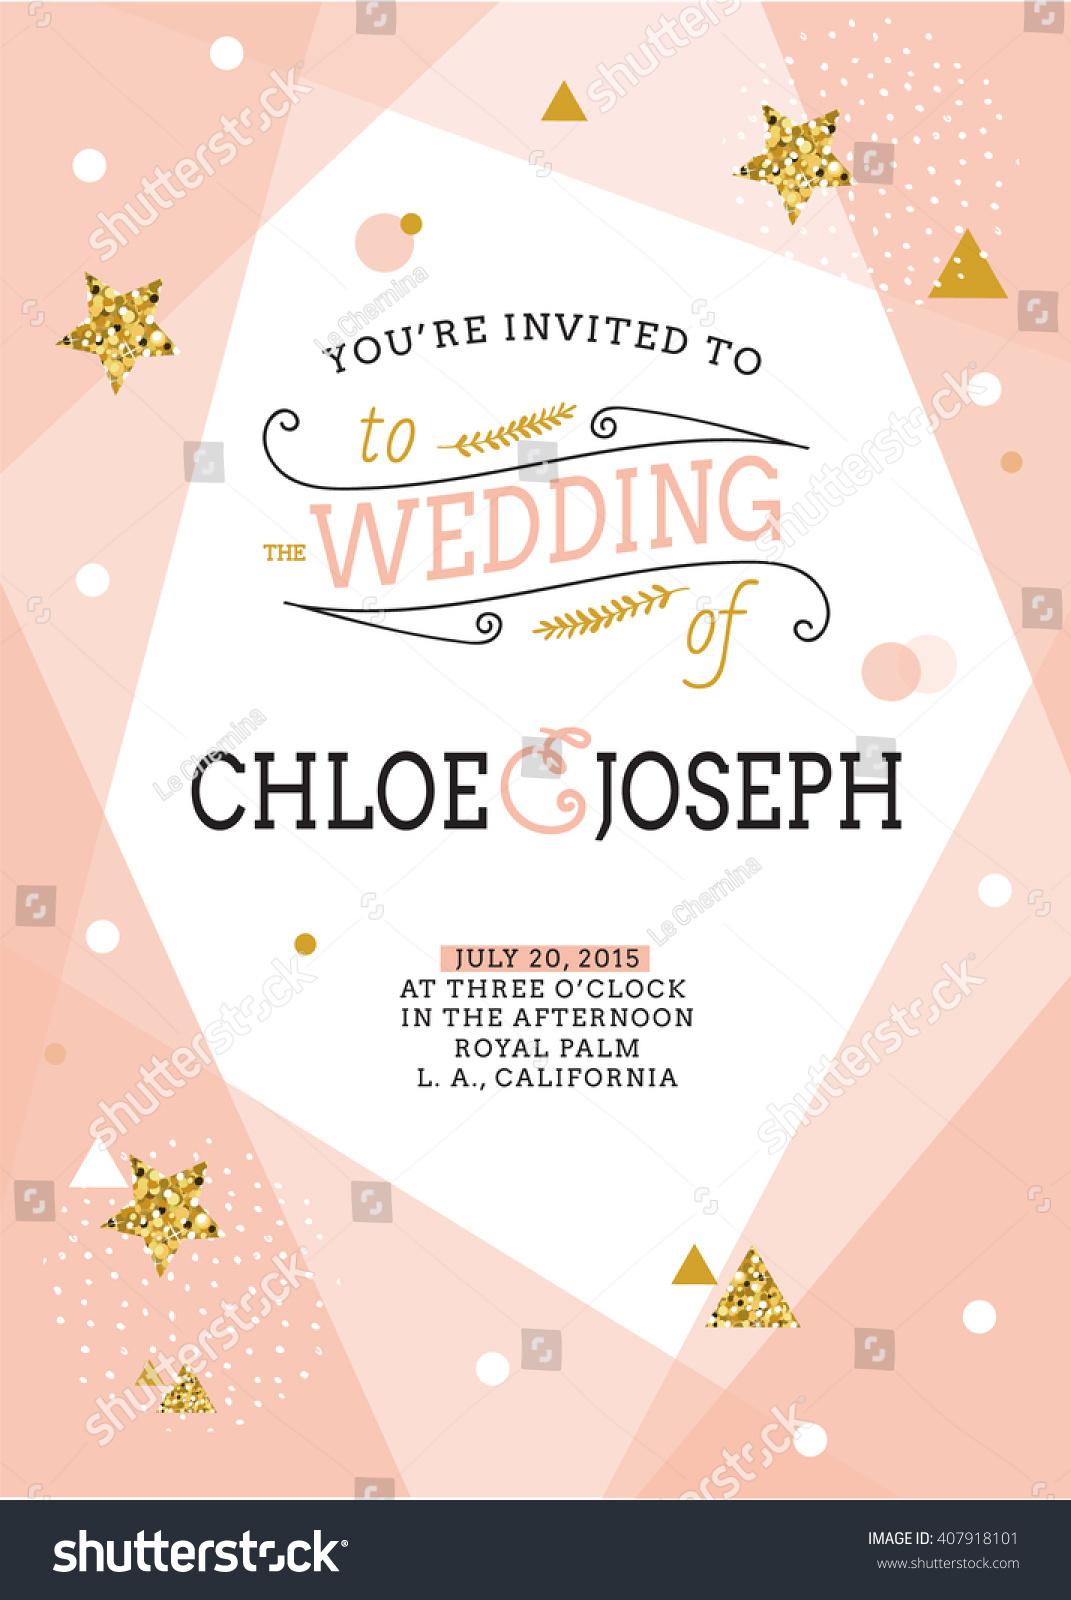 Wedding Invitation Card Save Date Card Stock Vector 407918101